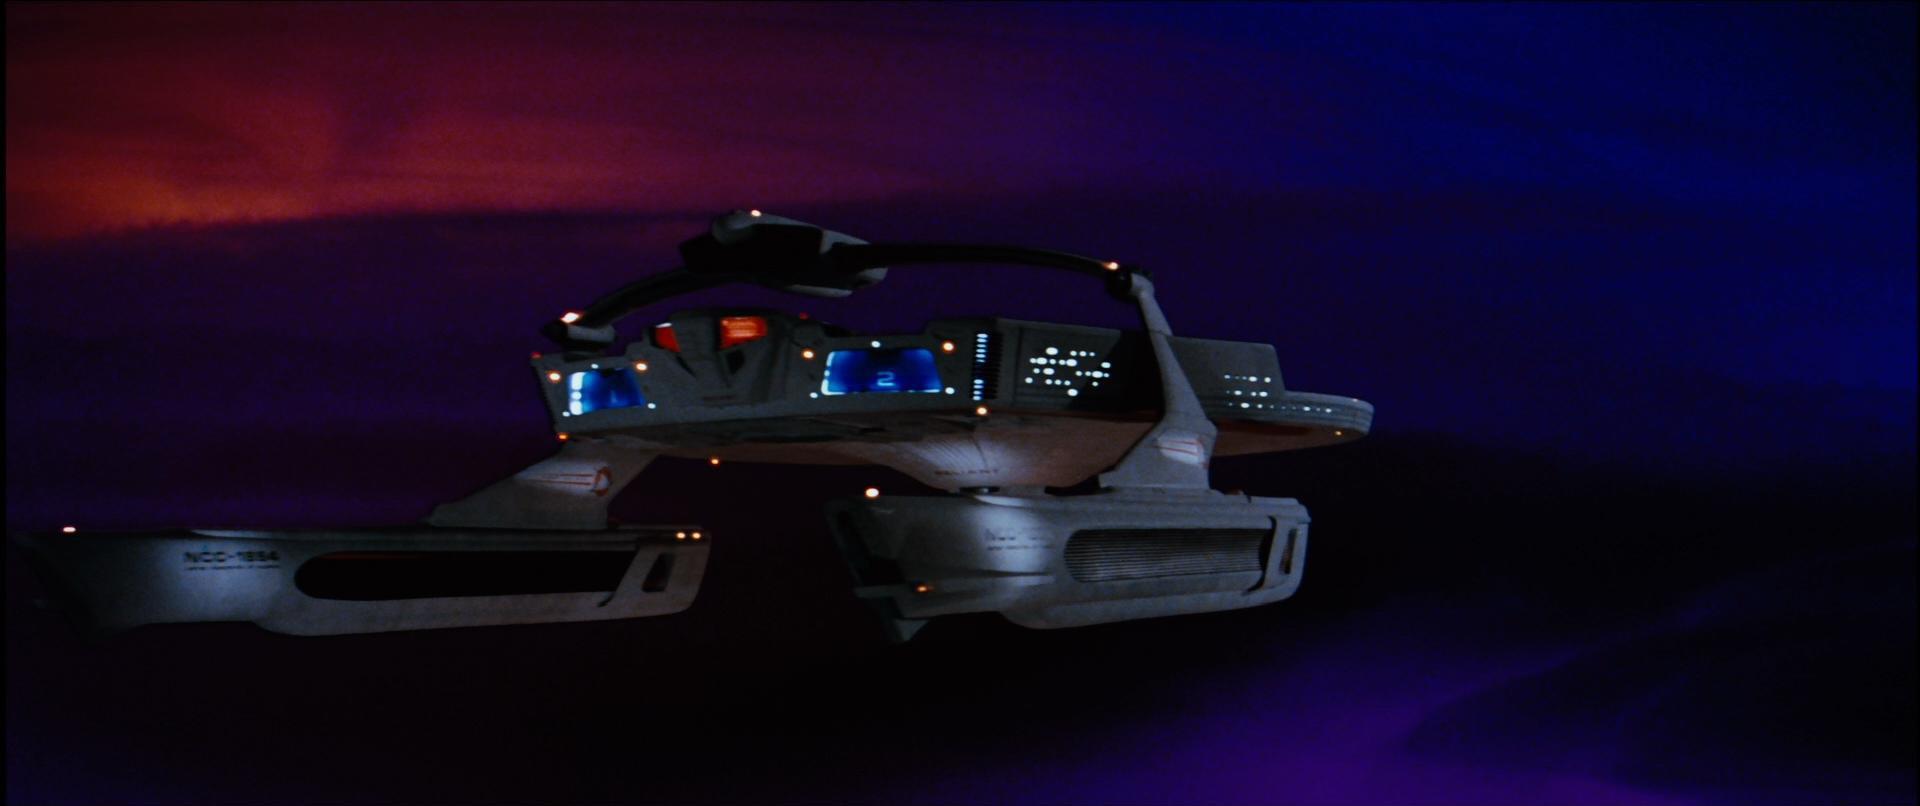 Star Trek II: Der Zorn des Khan (The Wrath of Khan) Blu-ray Screencap © CBS/Paramount